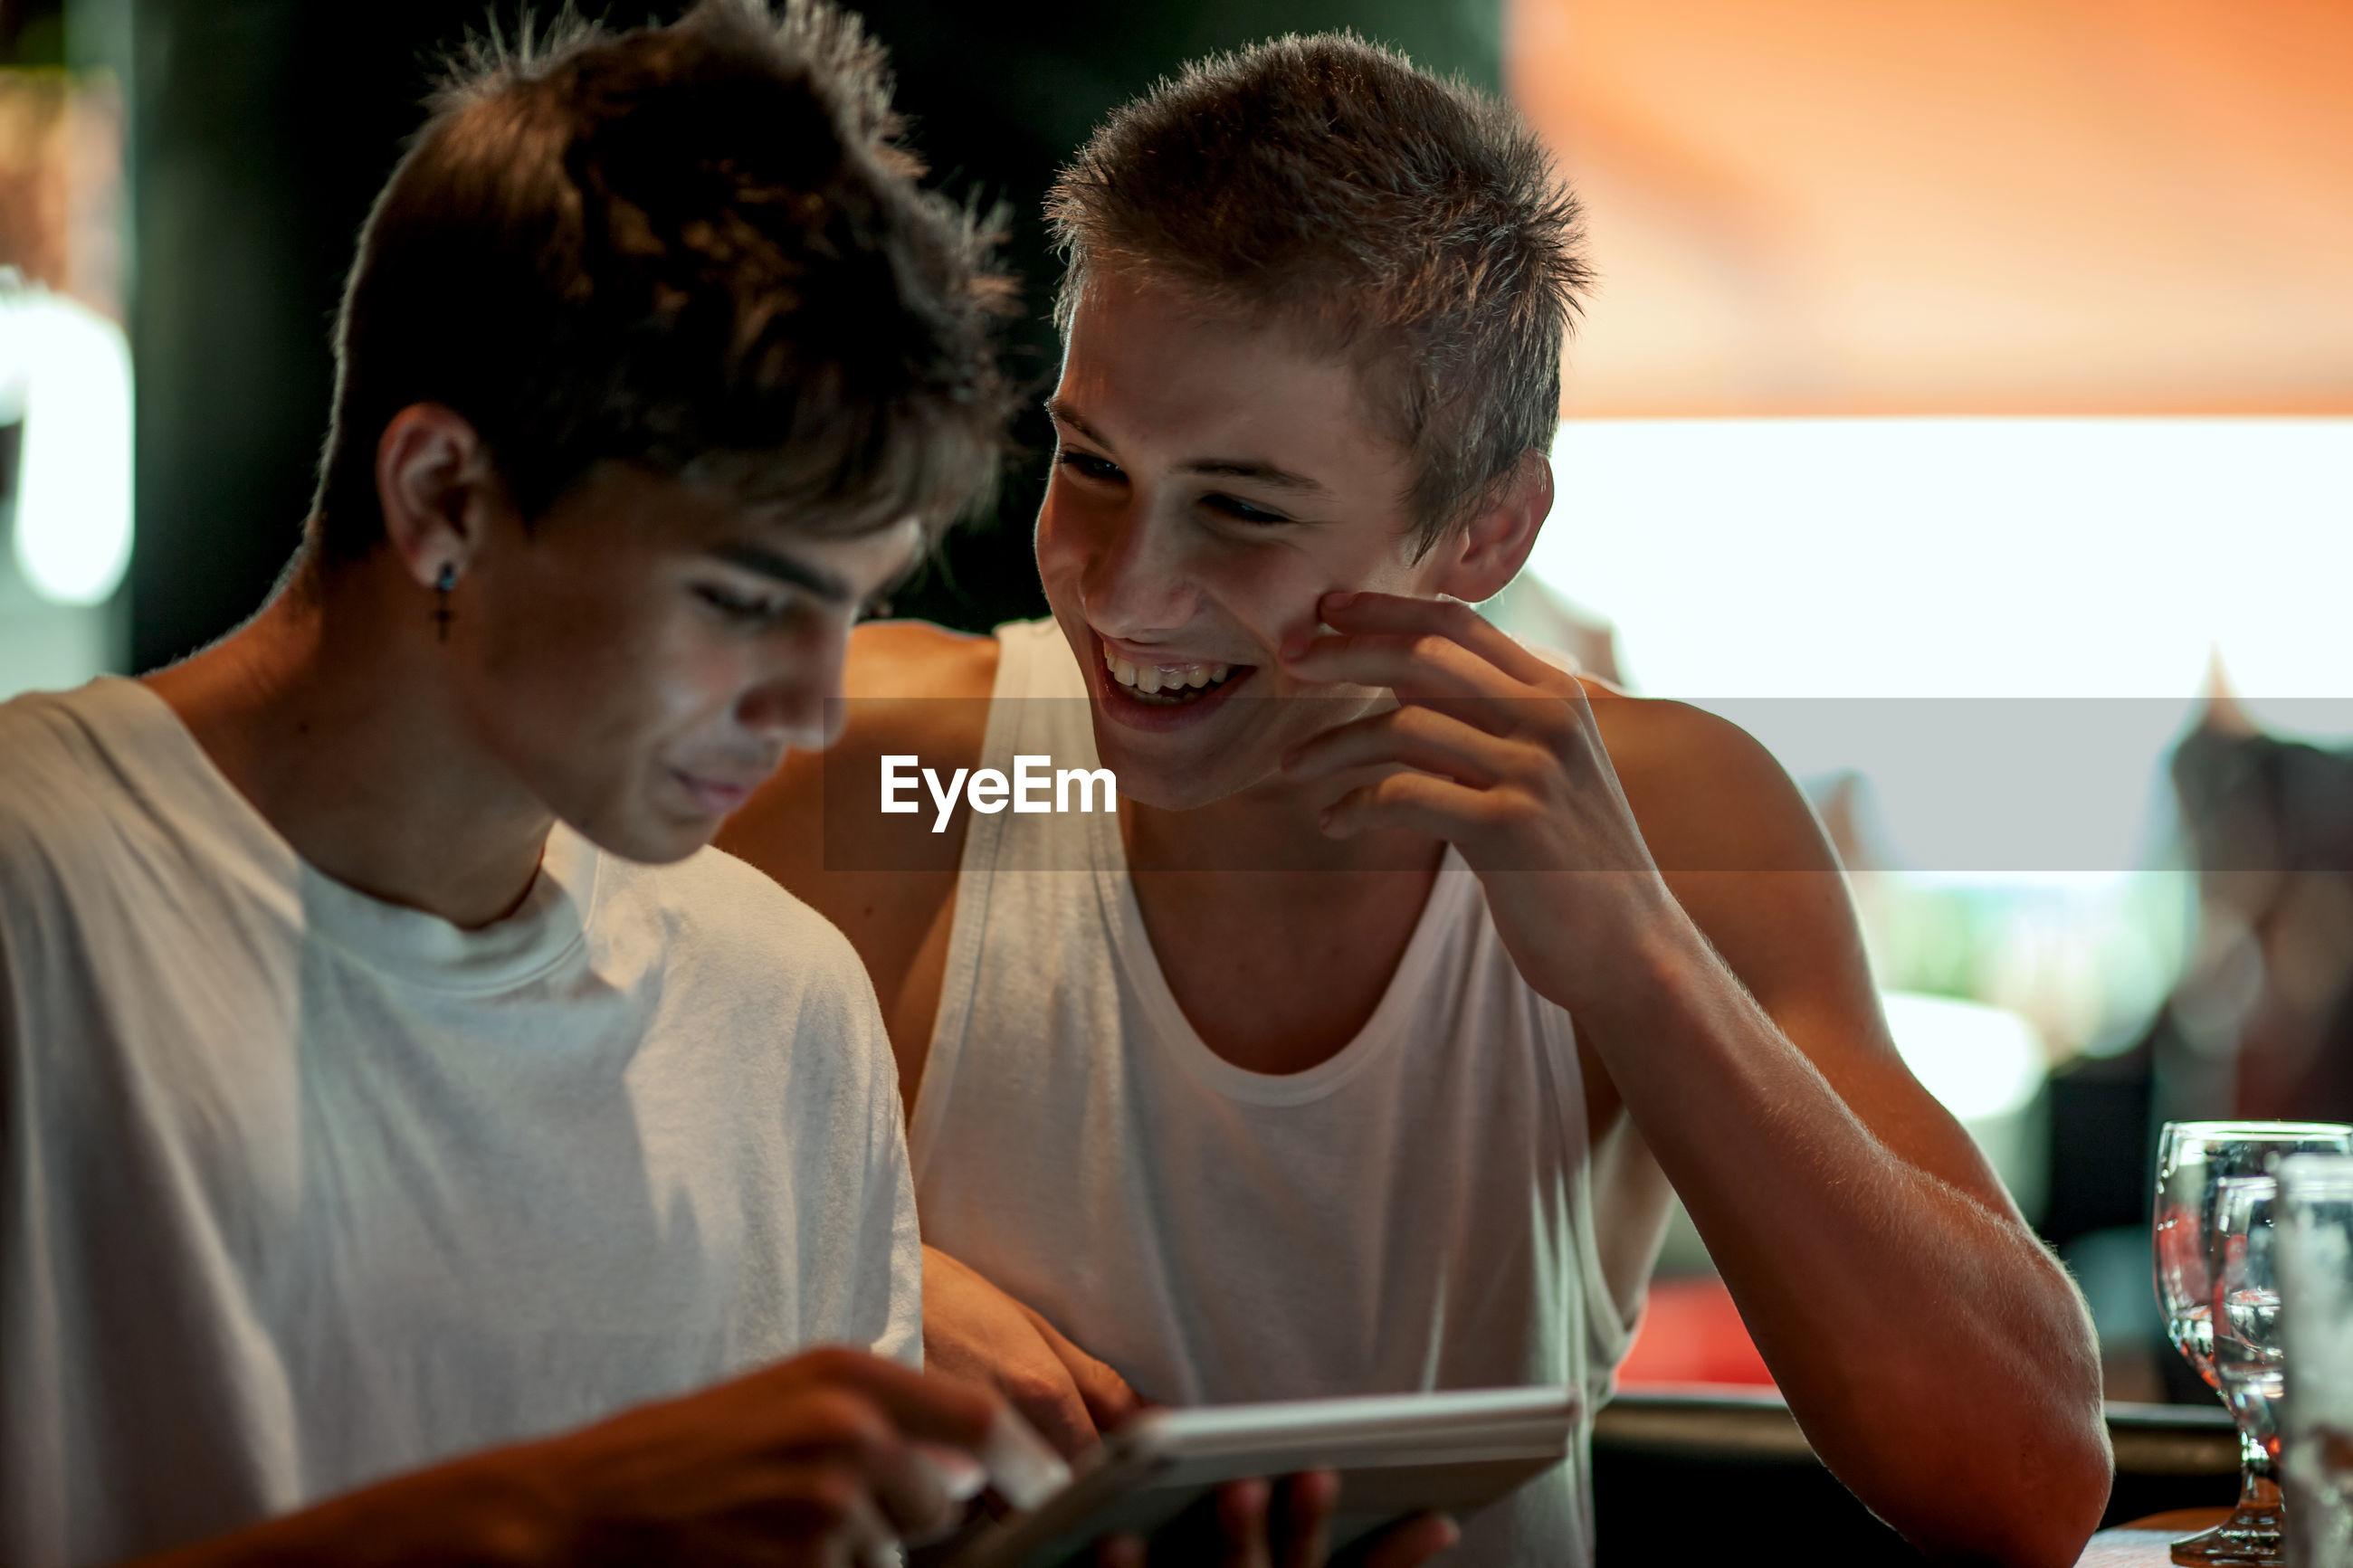 Smiling friends using digital tablet in restaurant